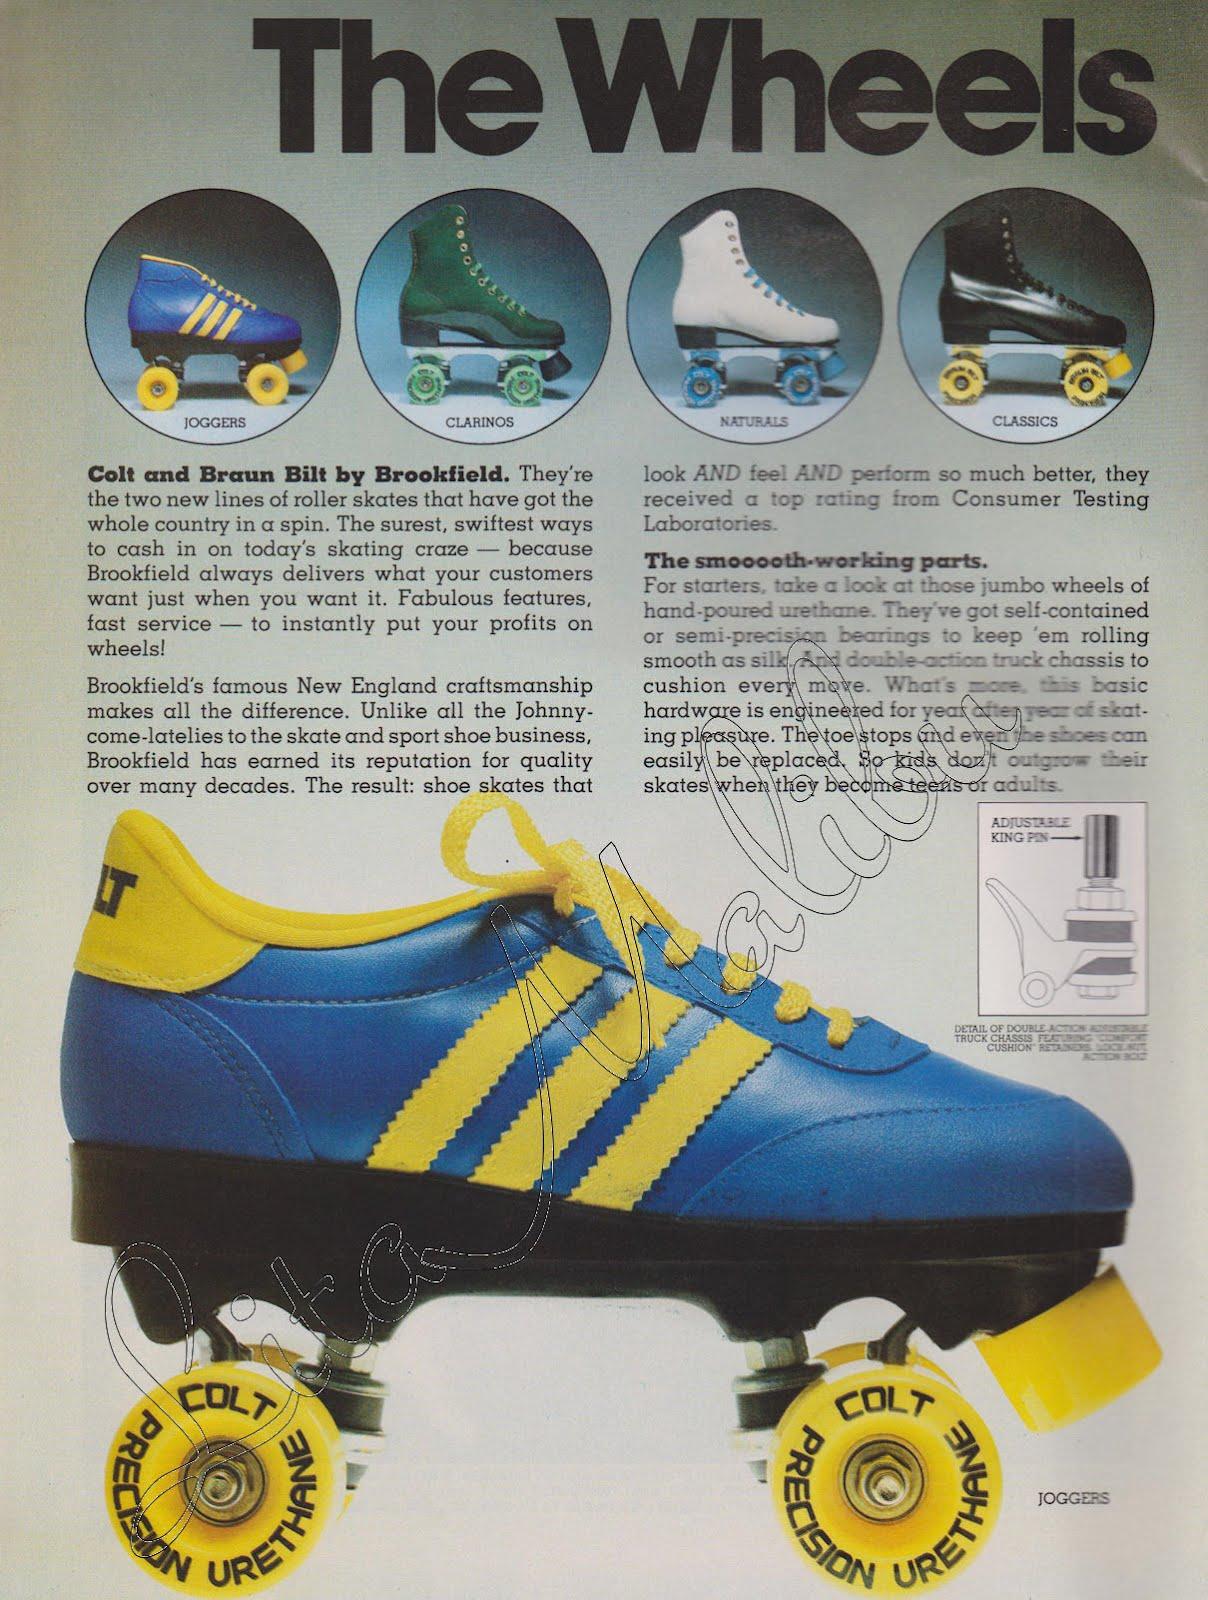 Roller skates in the 70s - Roller Skating Magazine October 1979